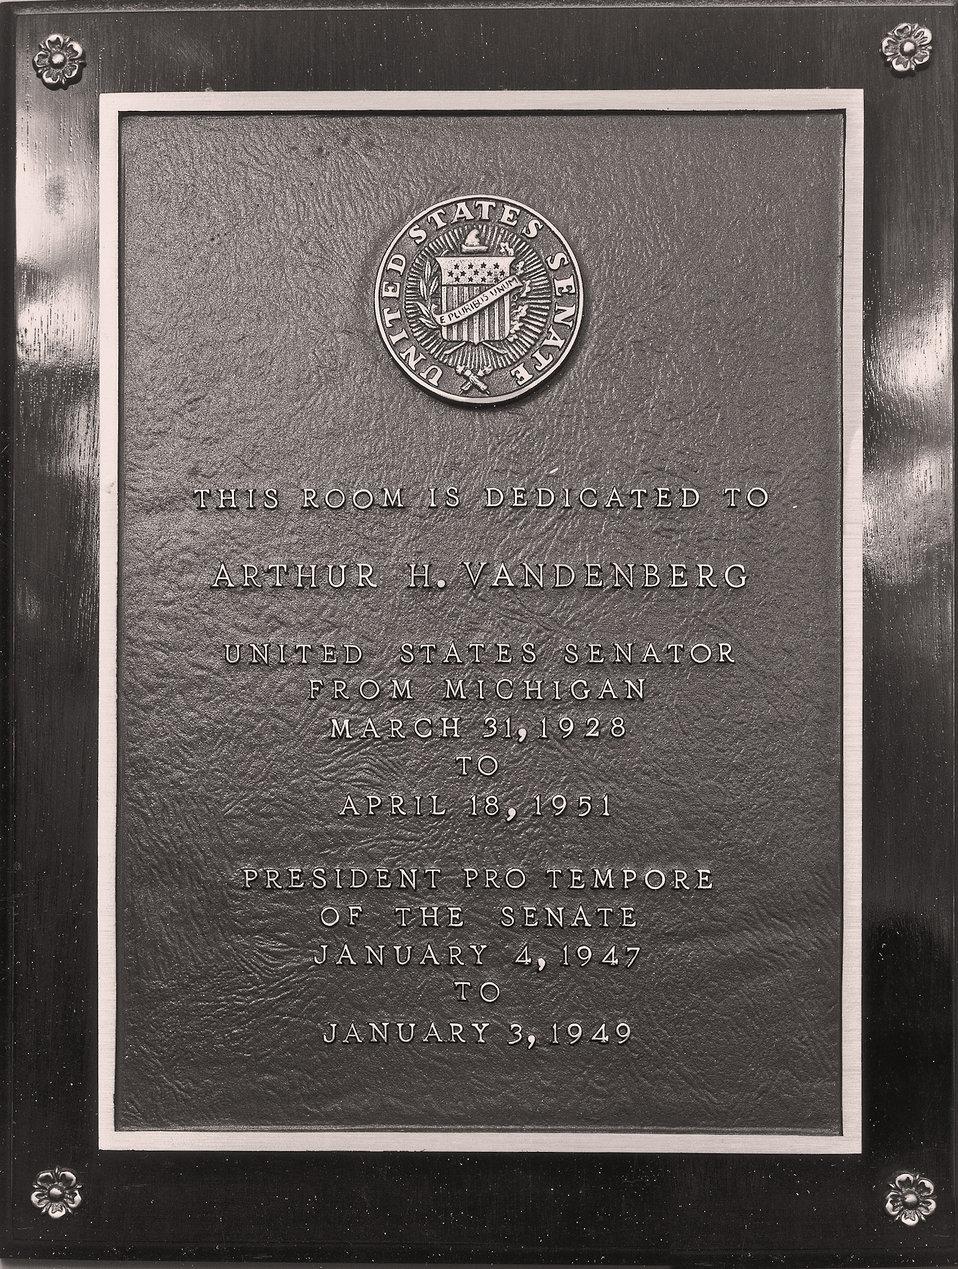 Arthur H. Vandenberg Room Plaque